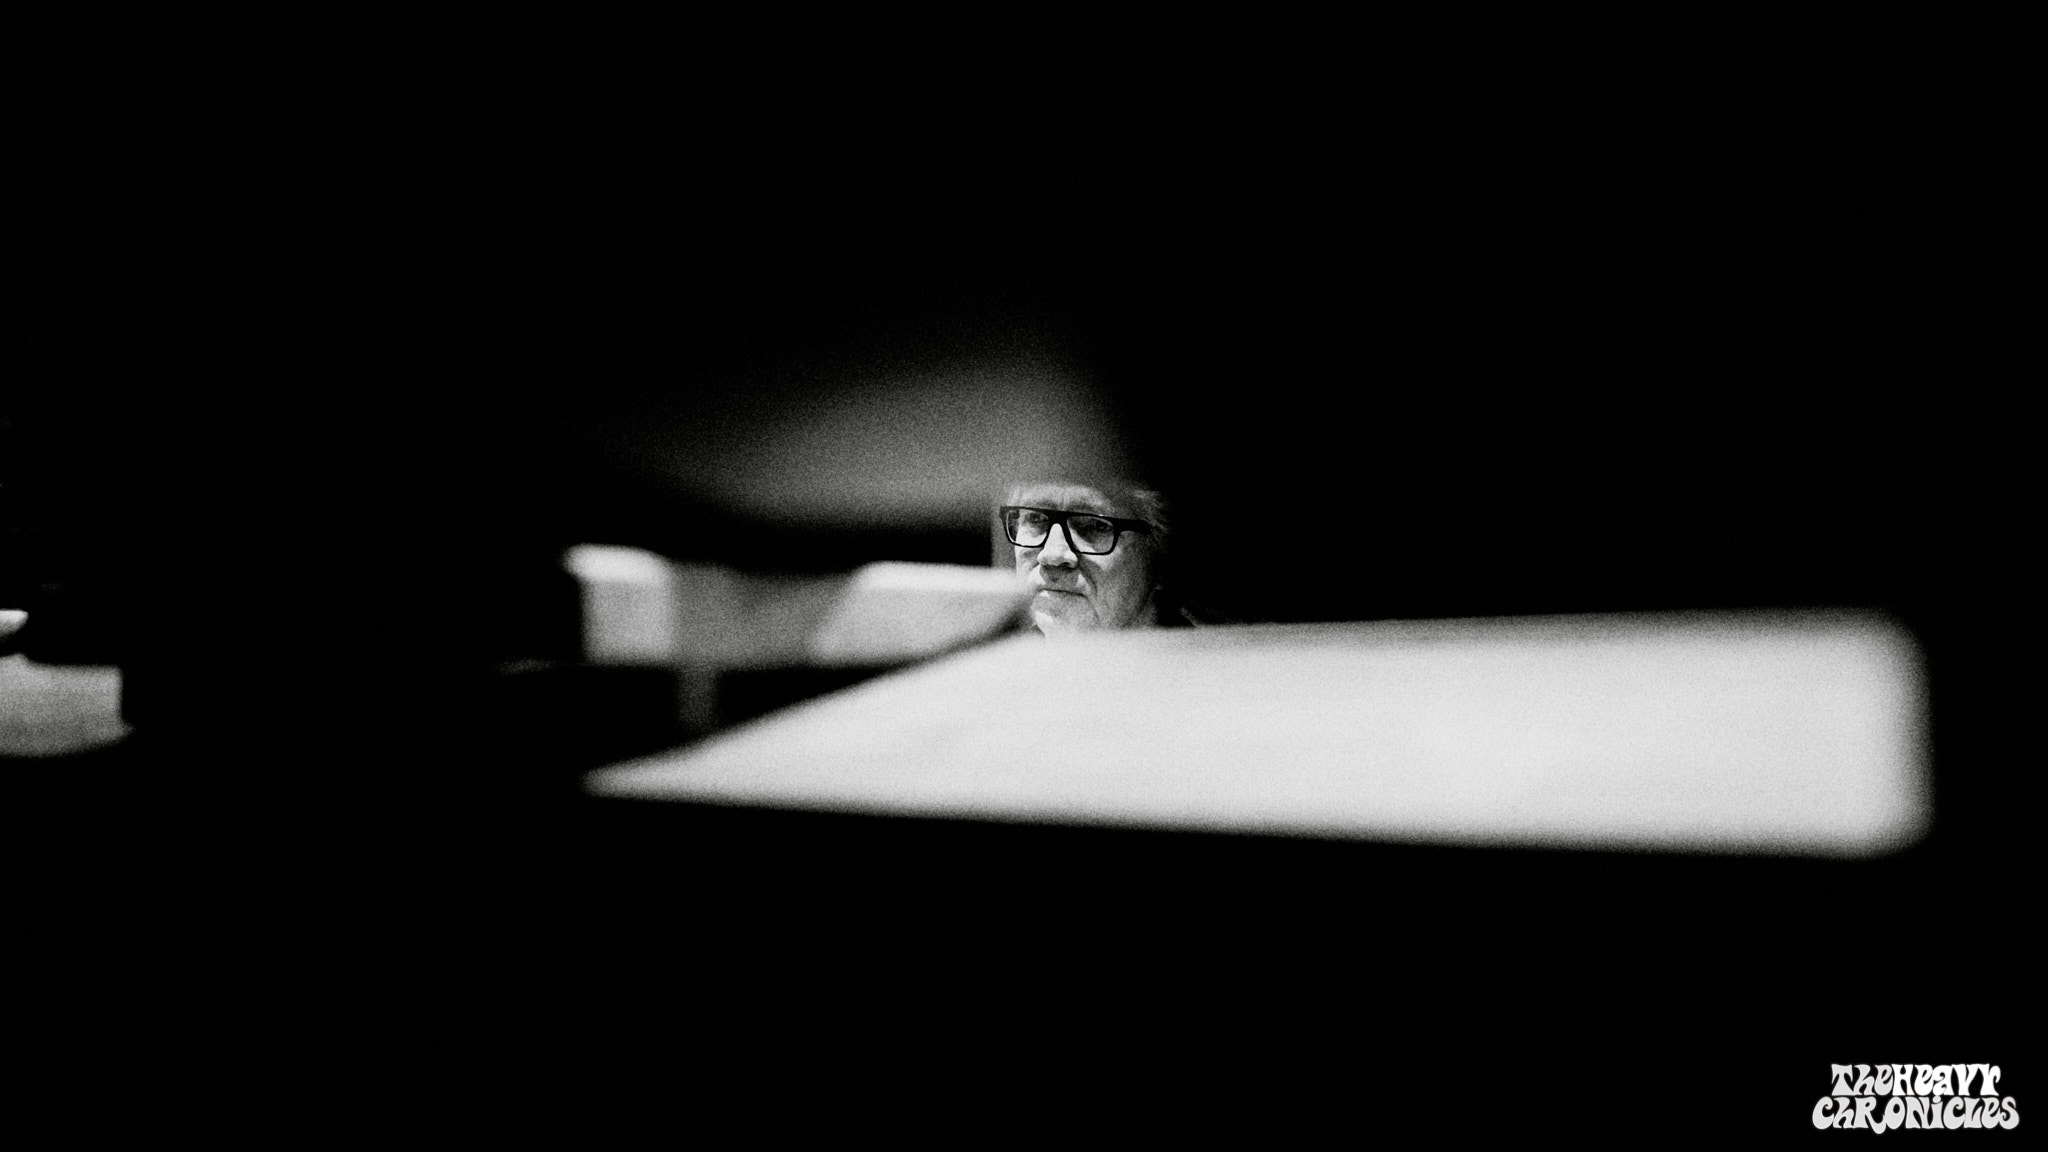 Elder-Studio-Black-Box-2019-Gael-Mathieu-The-Heavy-Chronicles-22